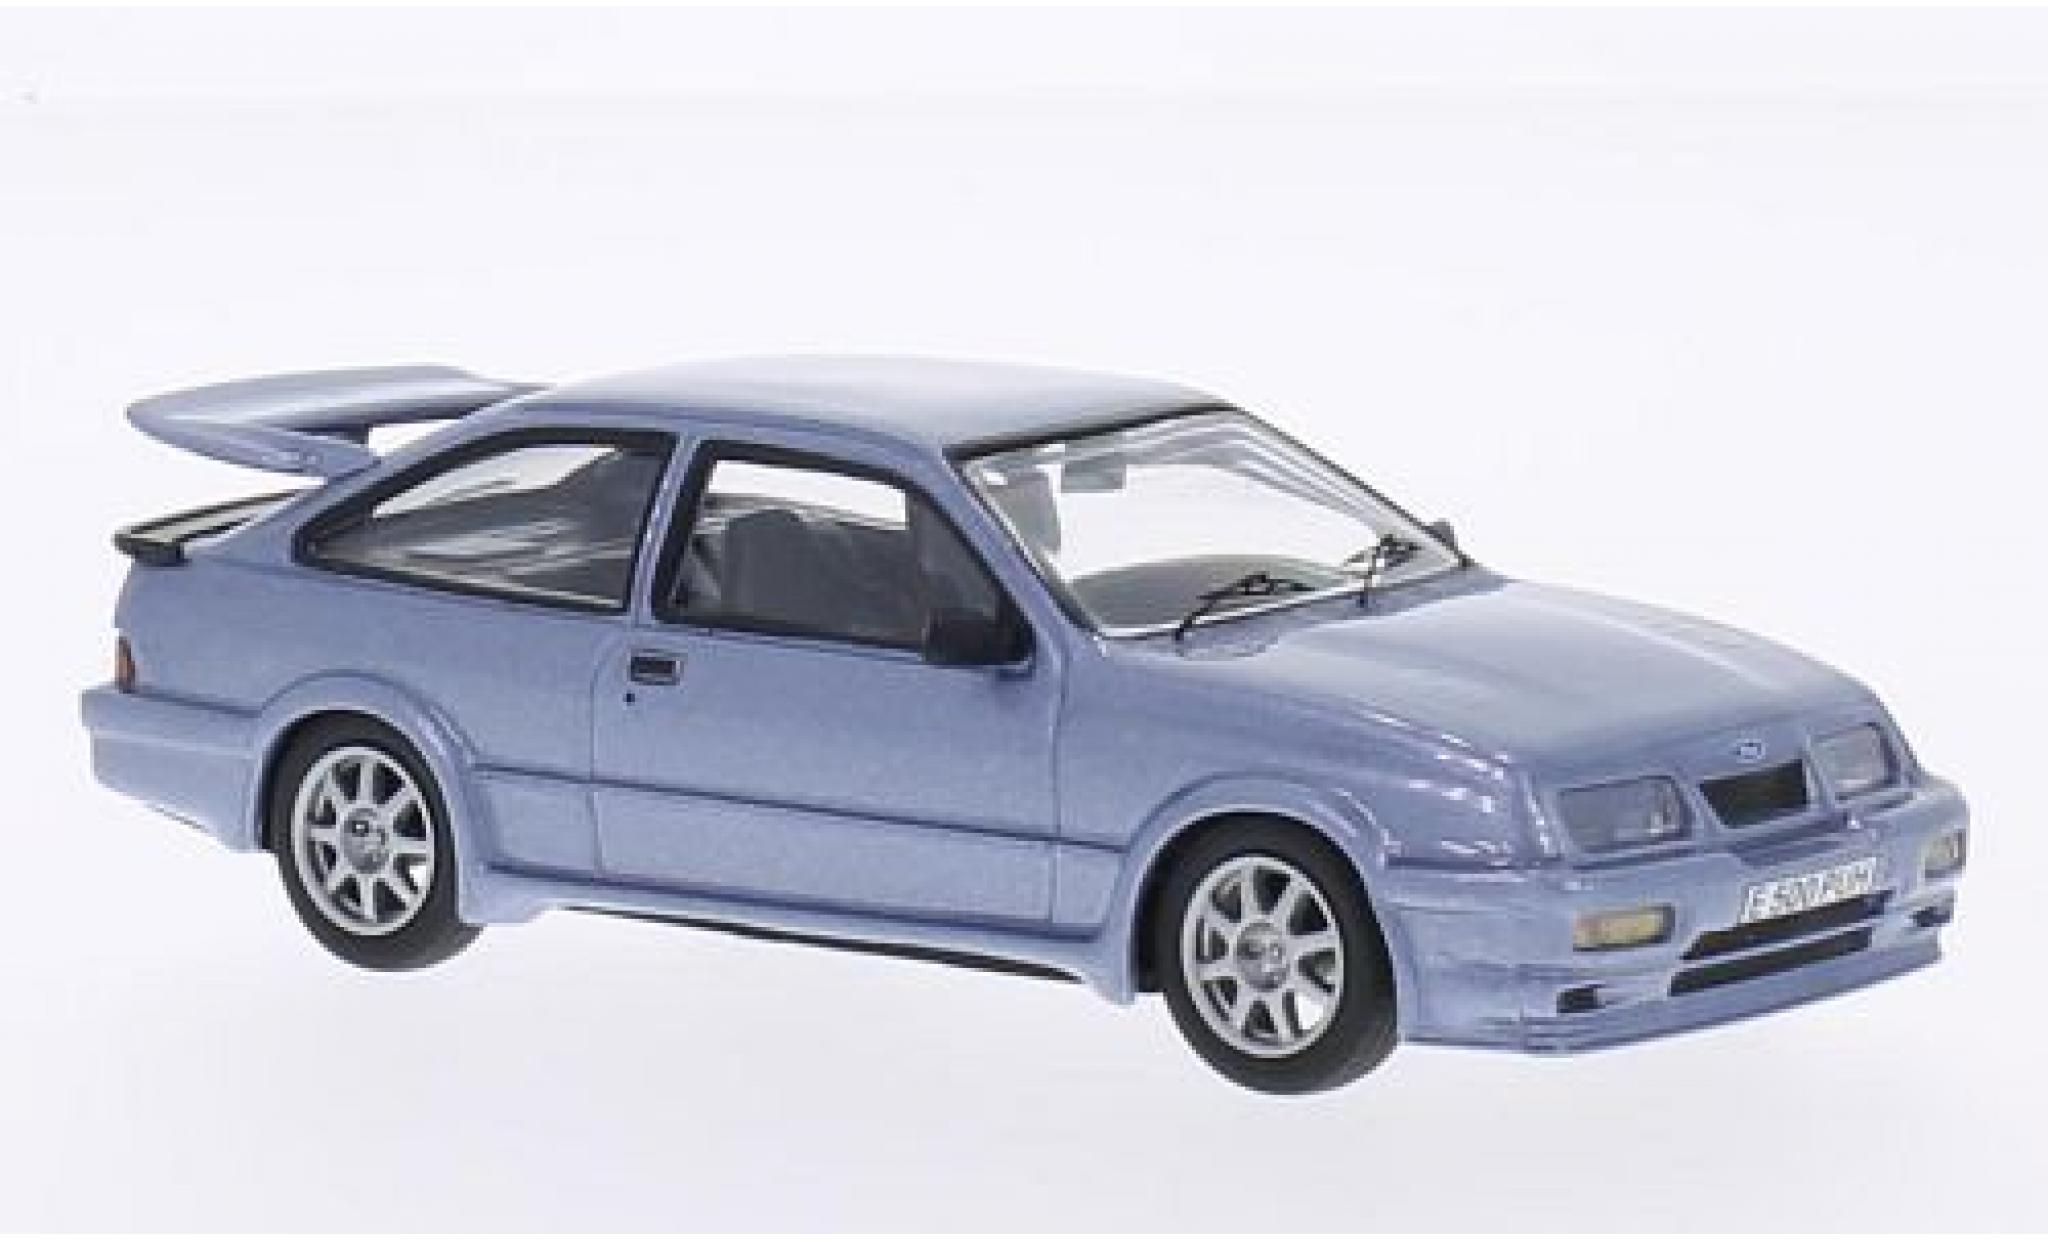 Ford Sierra 1/43 WhiteBox Cosworth RS500 metallise bleue RHD